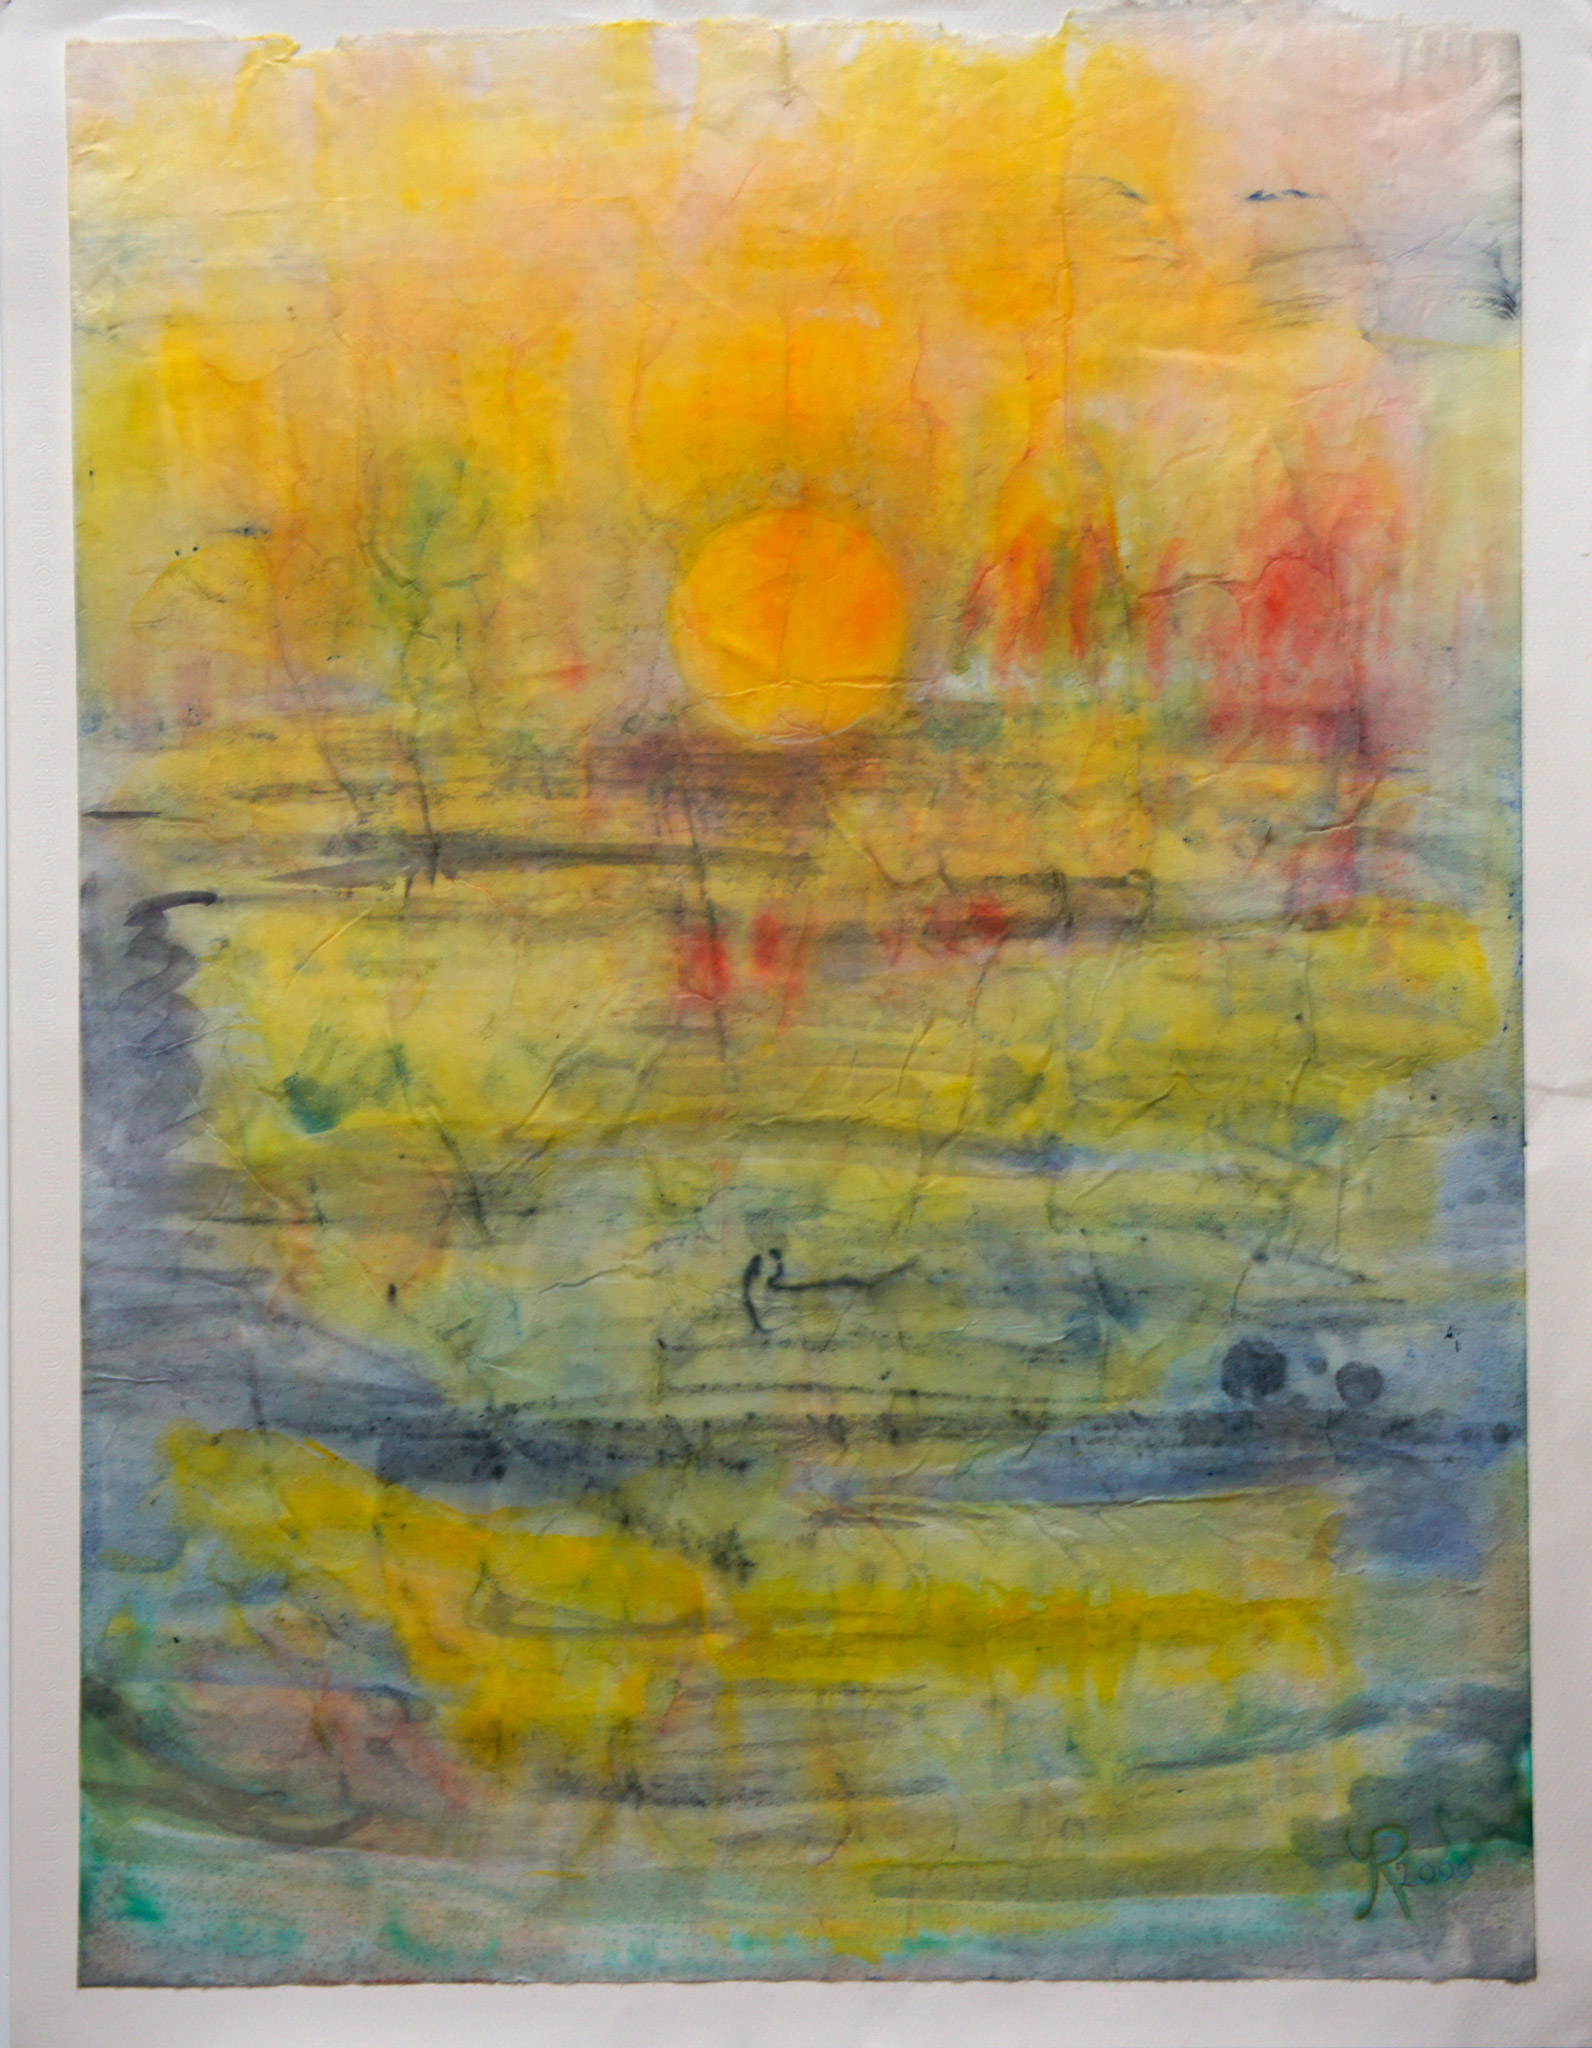 La mar teñida de amarillo  (The sea dyed yellow)